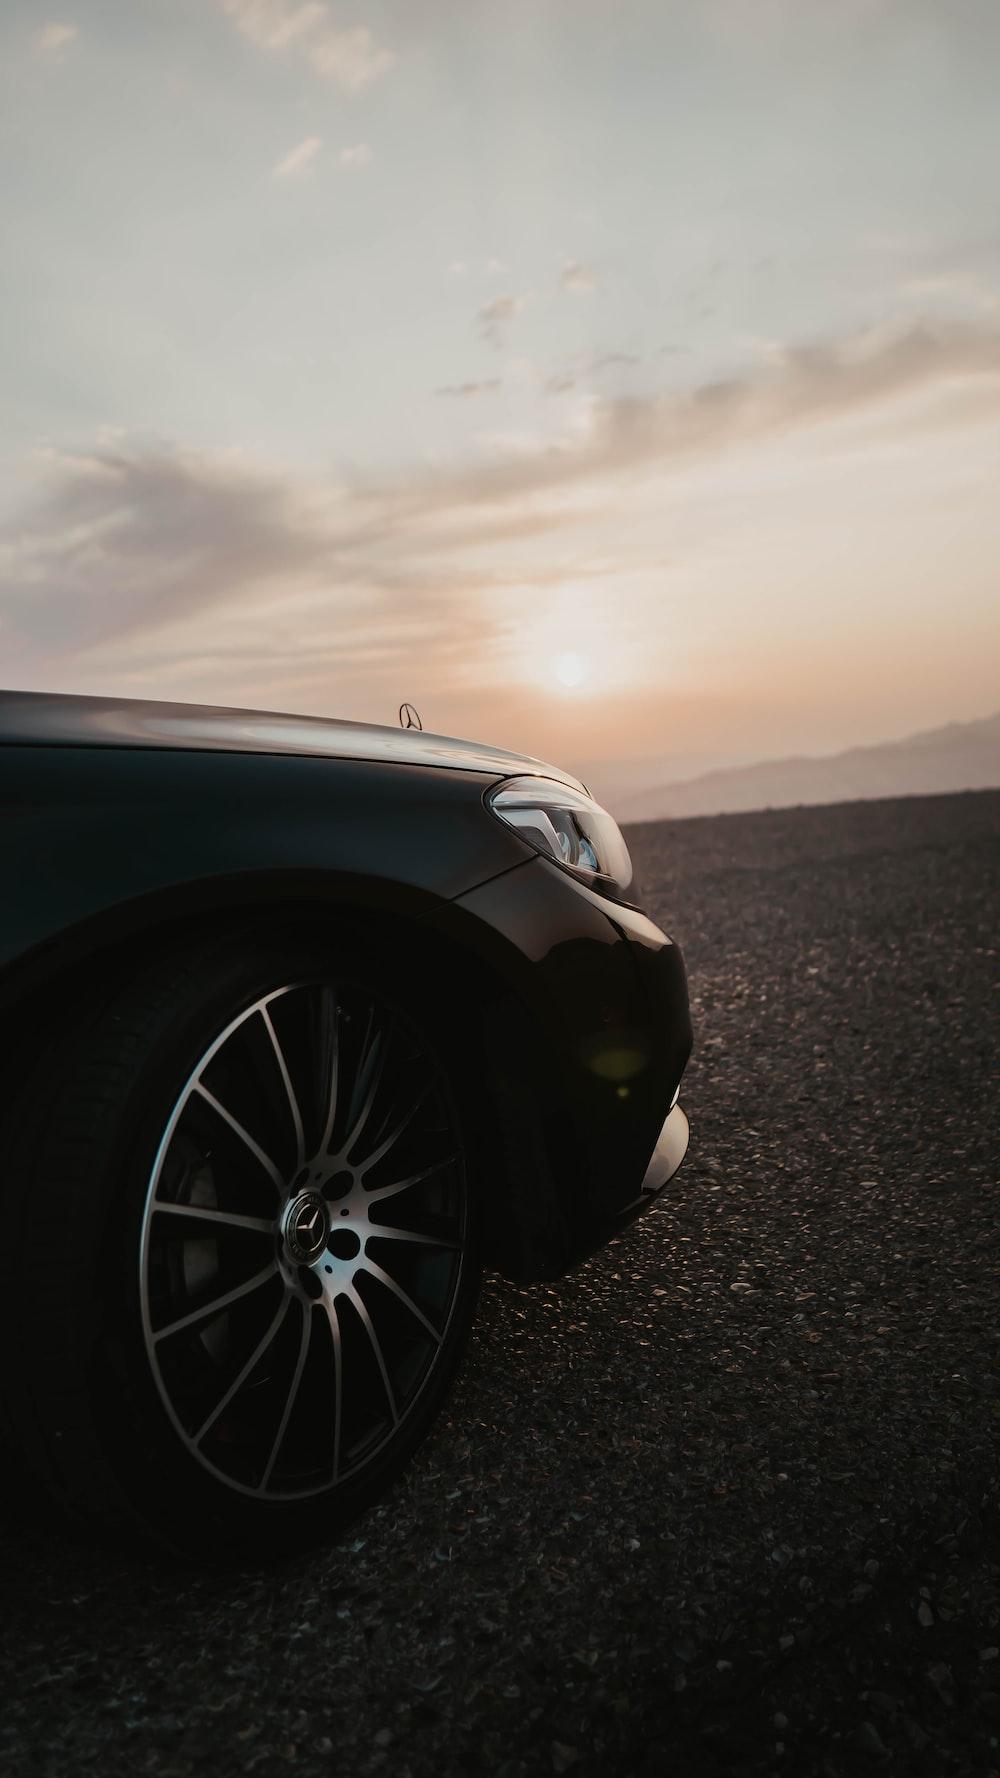 black Mercedes-Benz vehicle on pavement